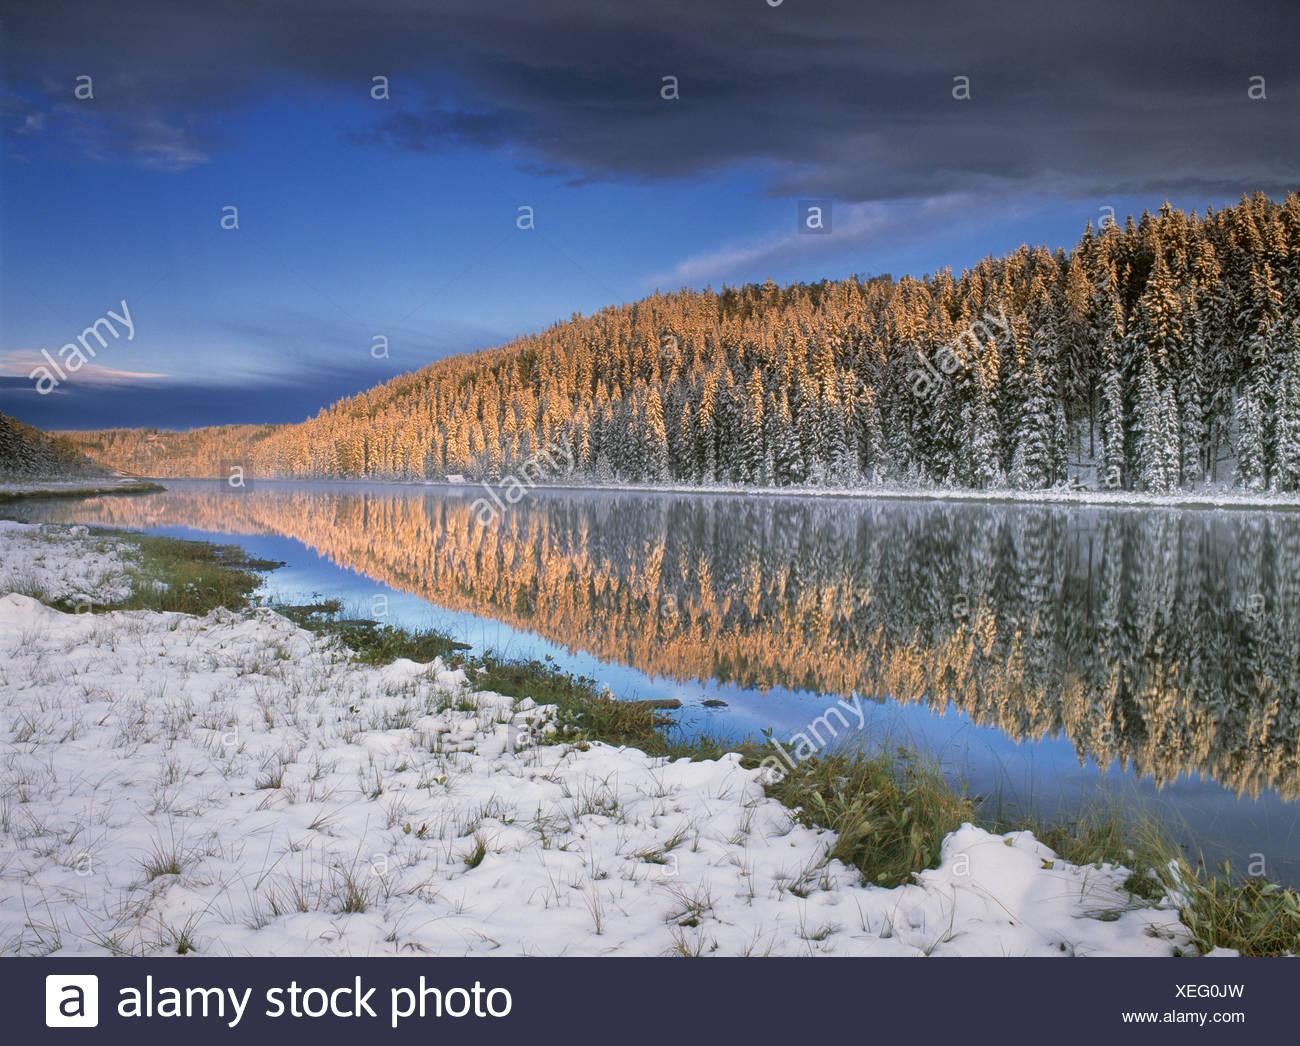 Late summer snow at Winchell Lake, Alberta, Canada. - Stock Image